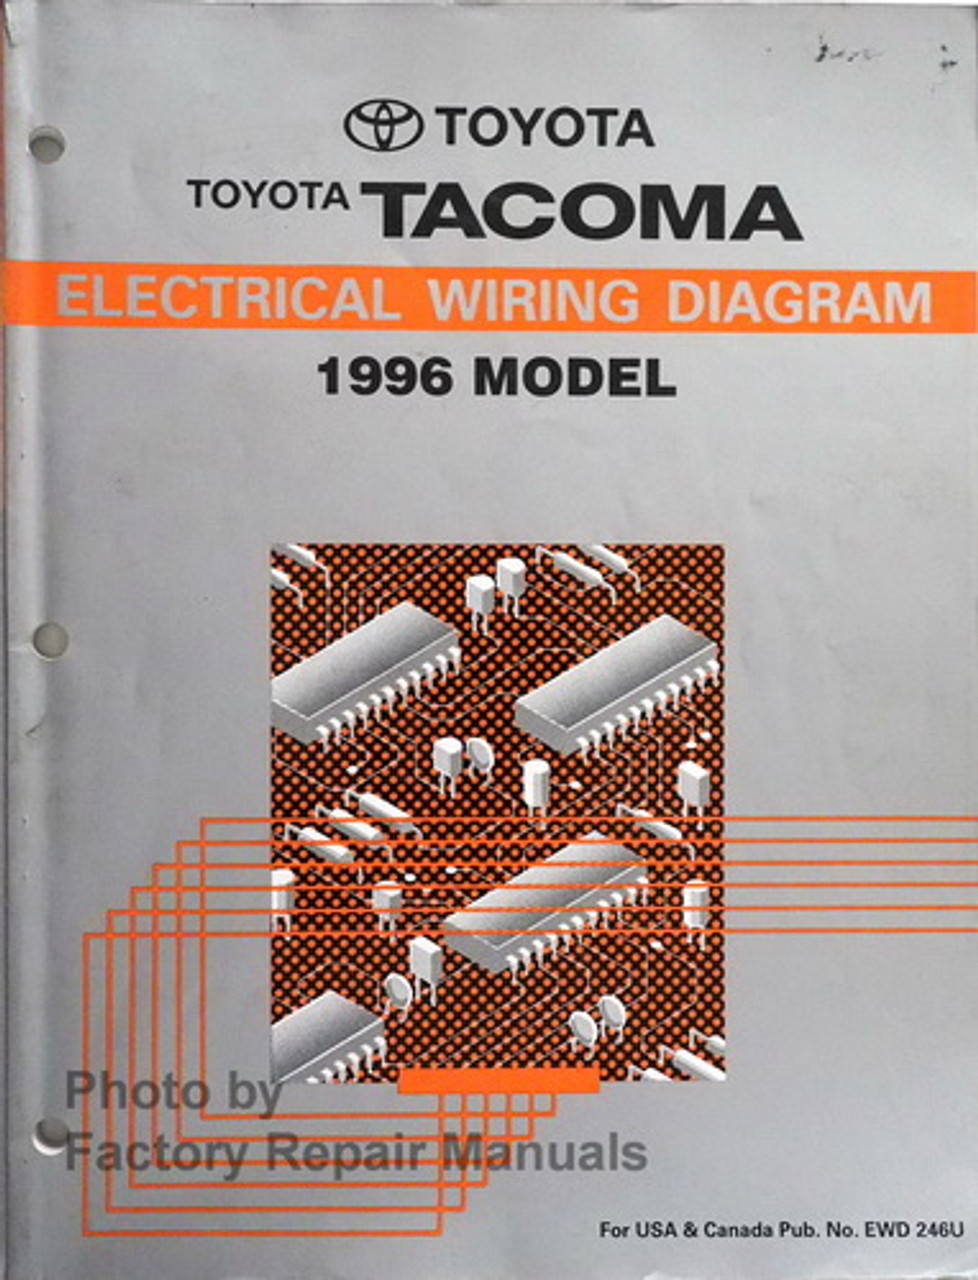 1996 toyota tacoma electrical wiring diagrams original factory ... 1996 tacoma wiring diagram 2017 tacoma stereo wiring diagram factory repair manuals